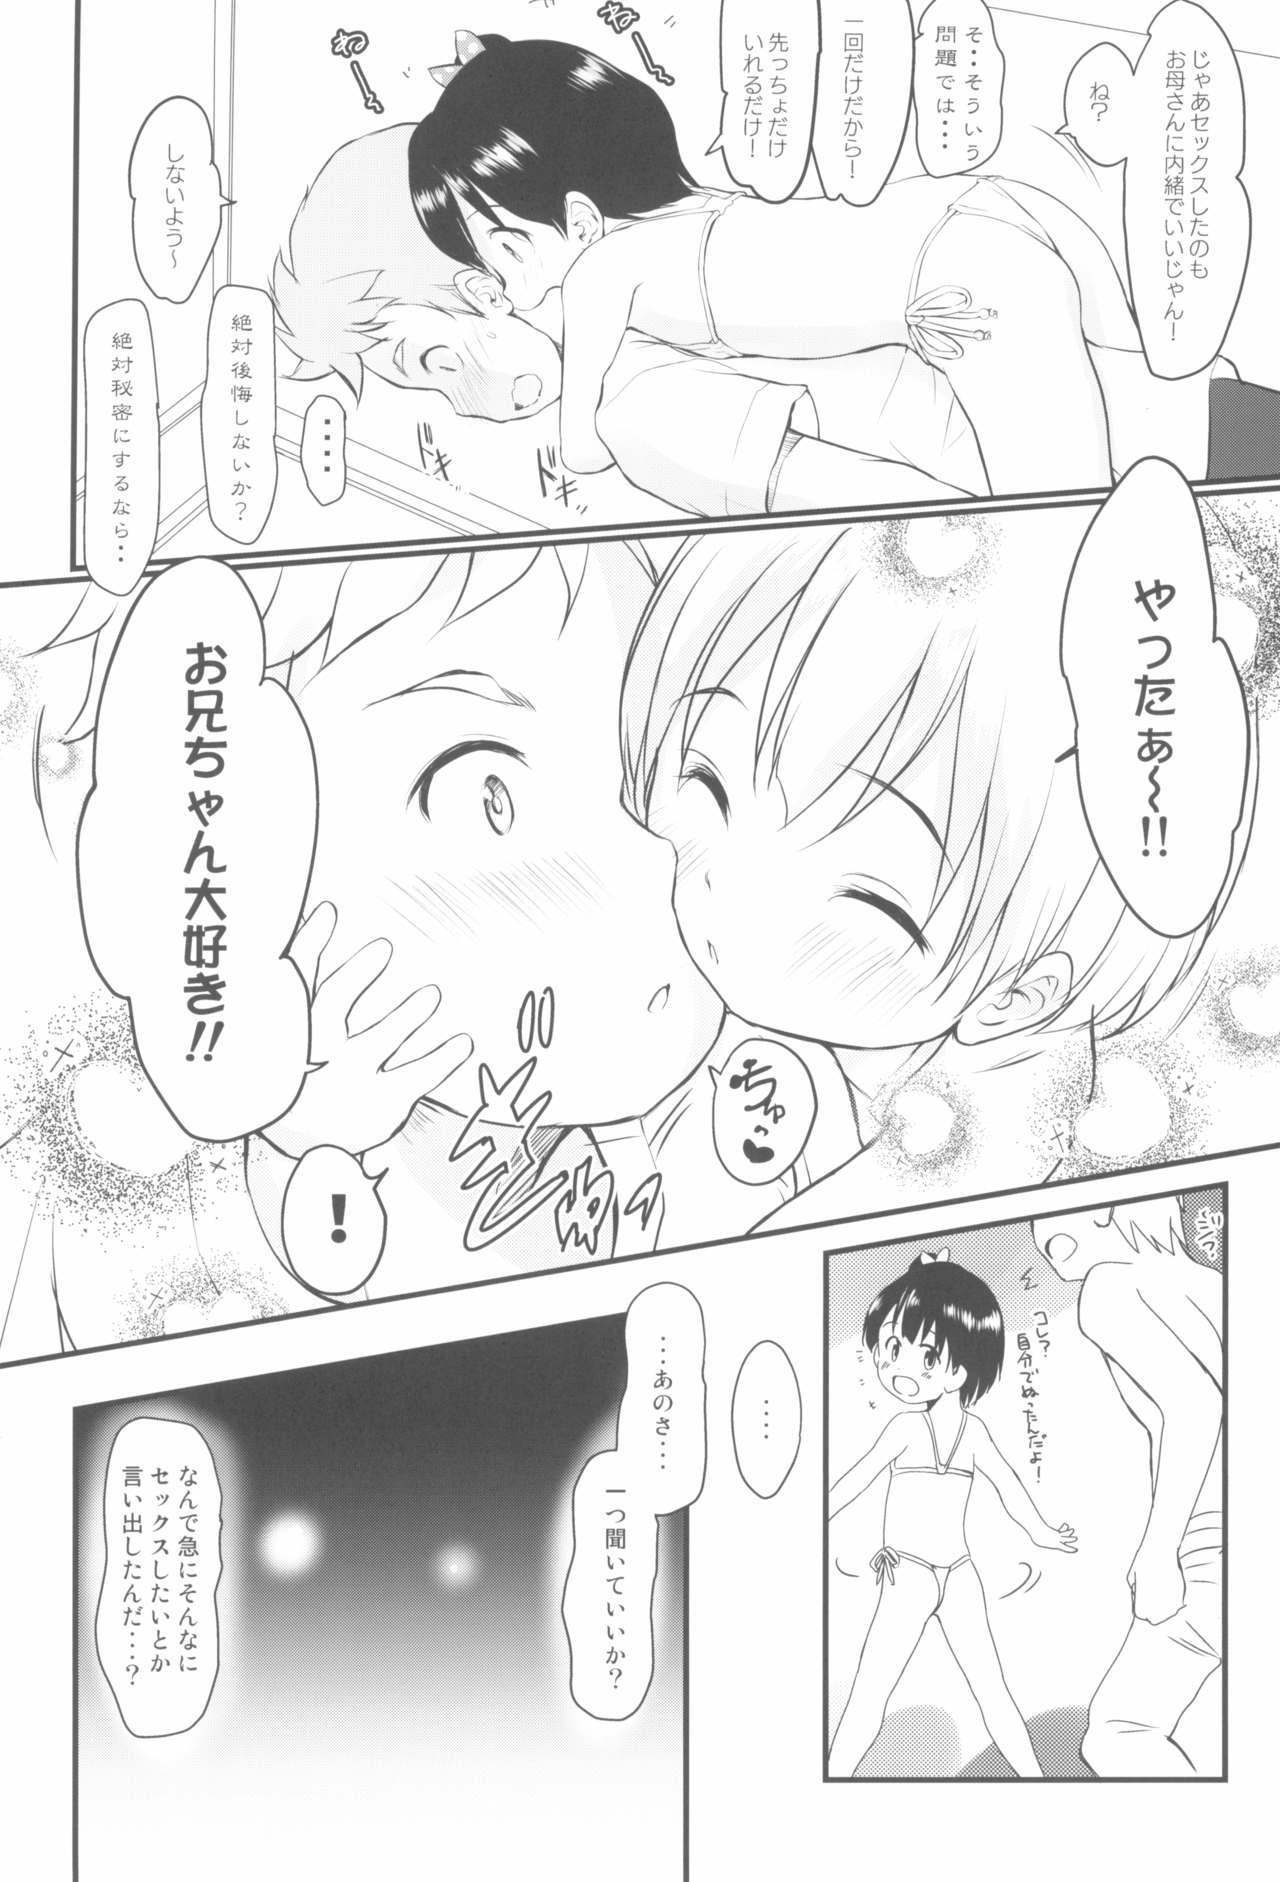 (C97) [Wancho-ke (Wancho)] Imouto wa Minna Onii-chan ga Suki! 5-Kaiteiban- 13